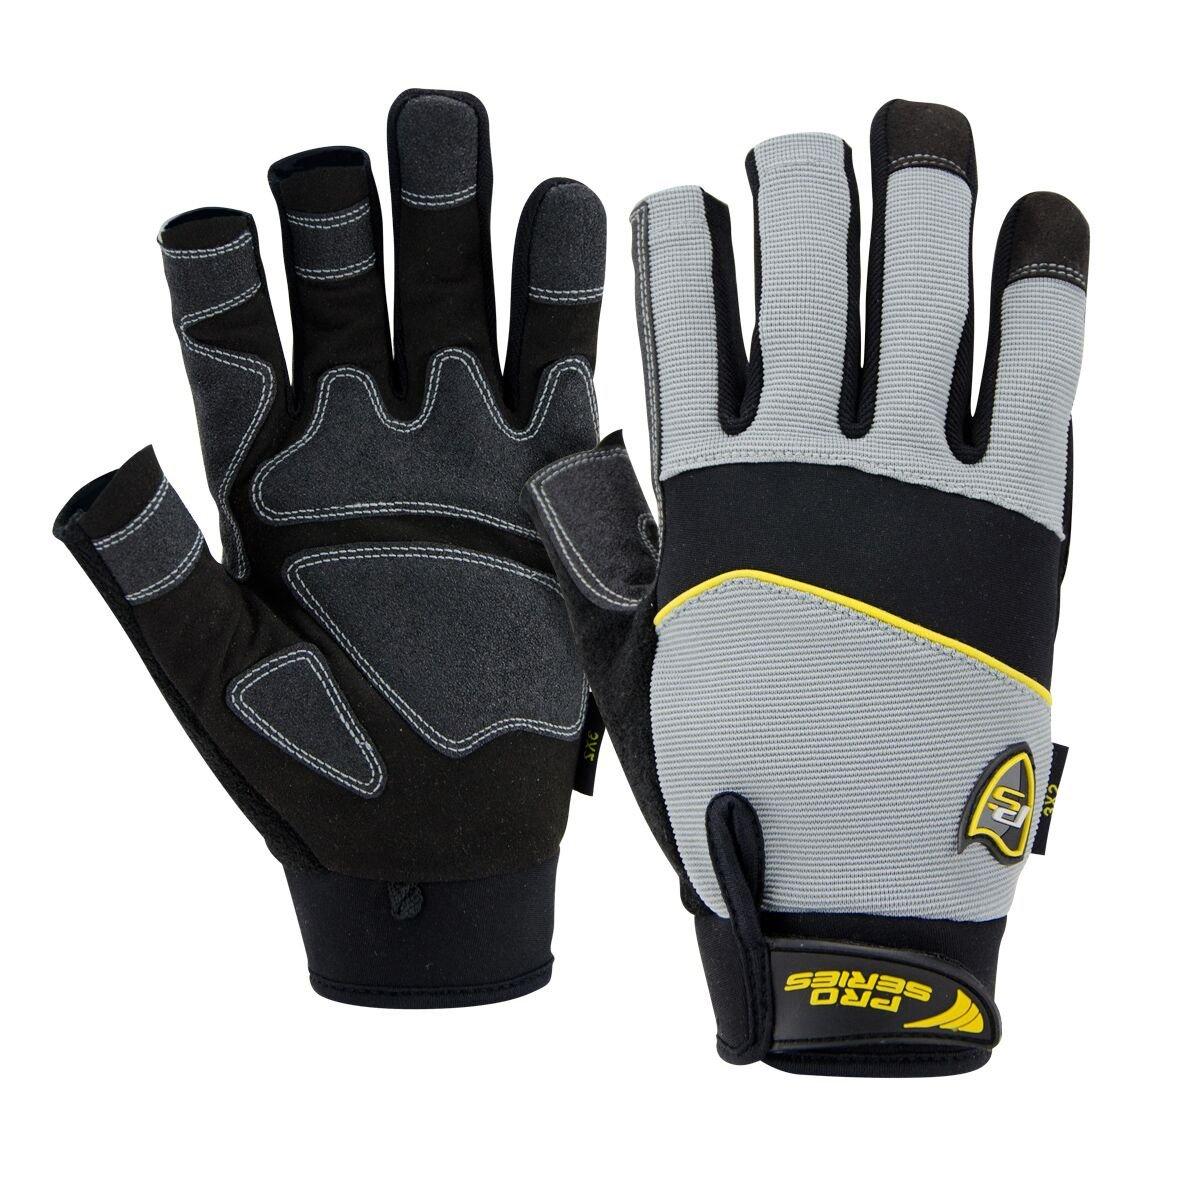 West Chester 86700 Pro Series Gloves, 2XL, Black